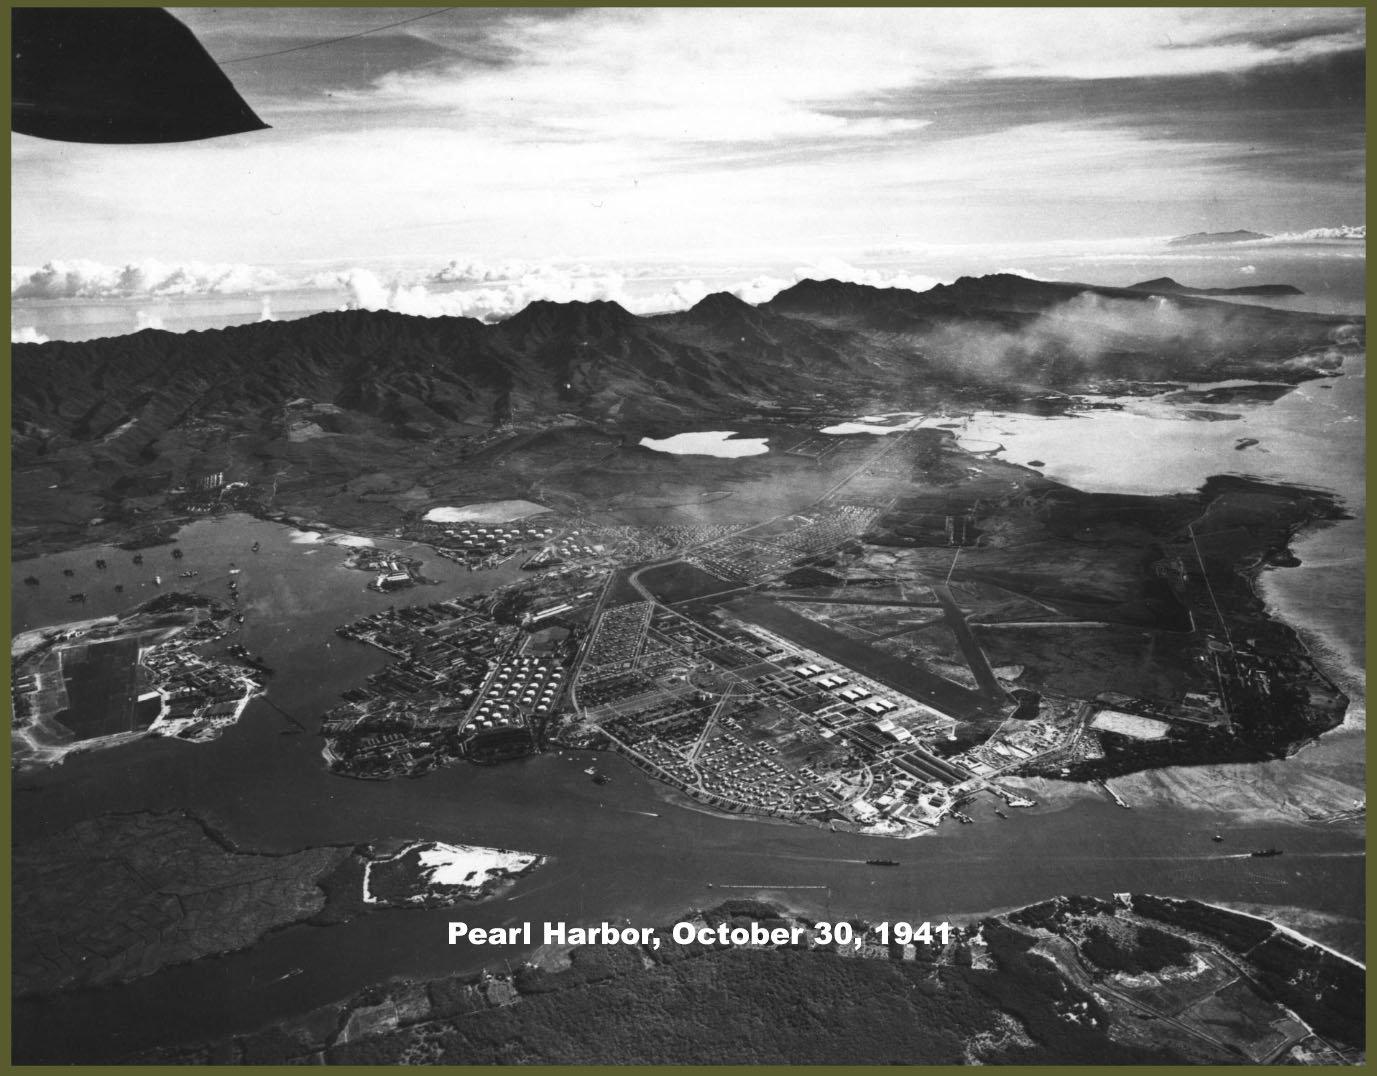 Pearl Harbor October 30, 1941